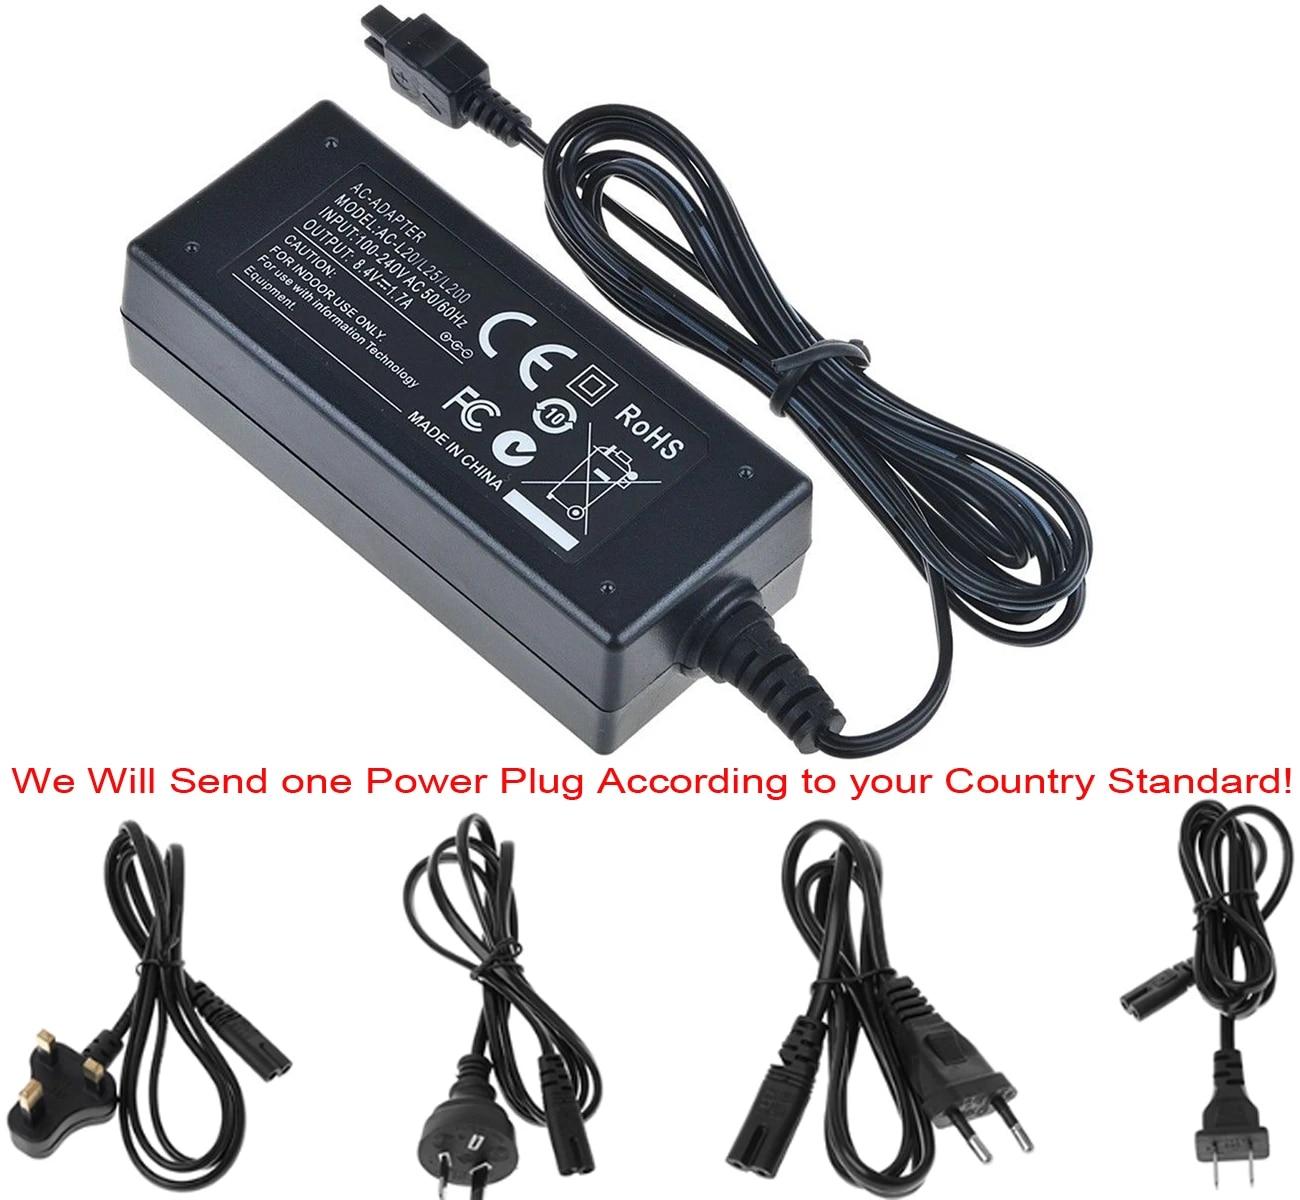 DCR-SR20 AC Power Adapter Charger for Sony DCR-SR15 DCR-SR21 Handycam Camcorder